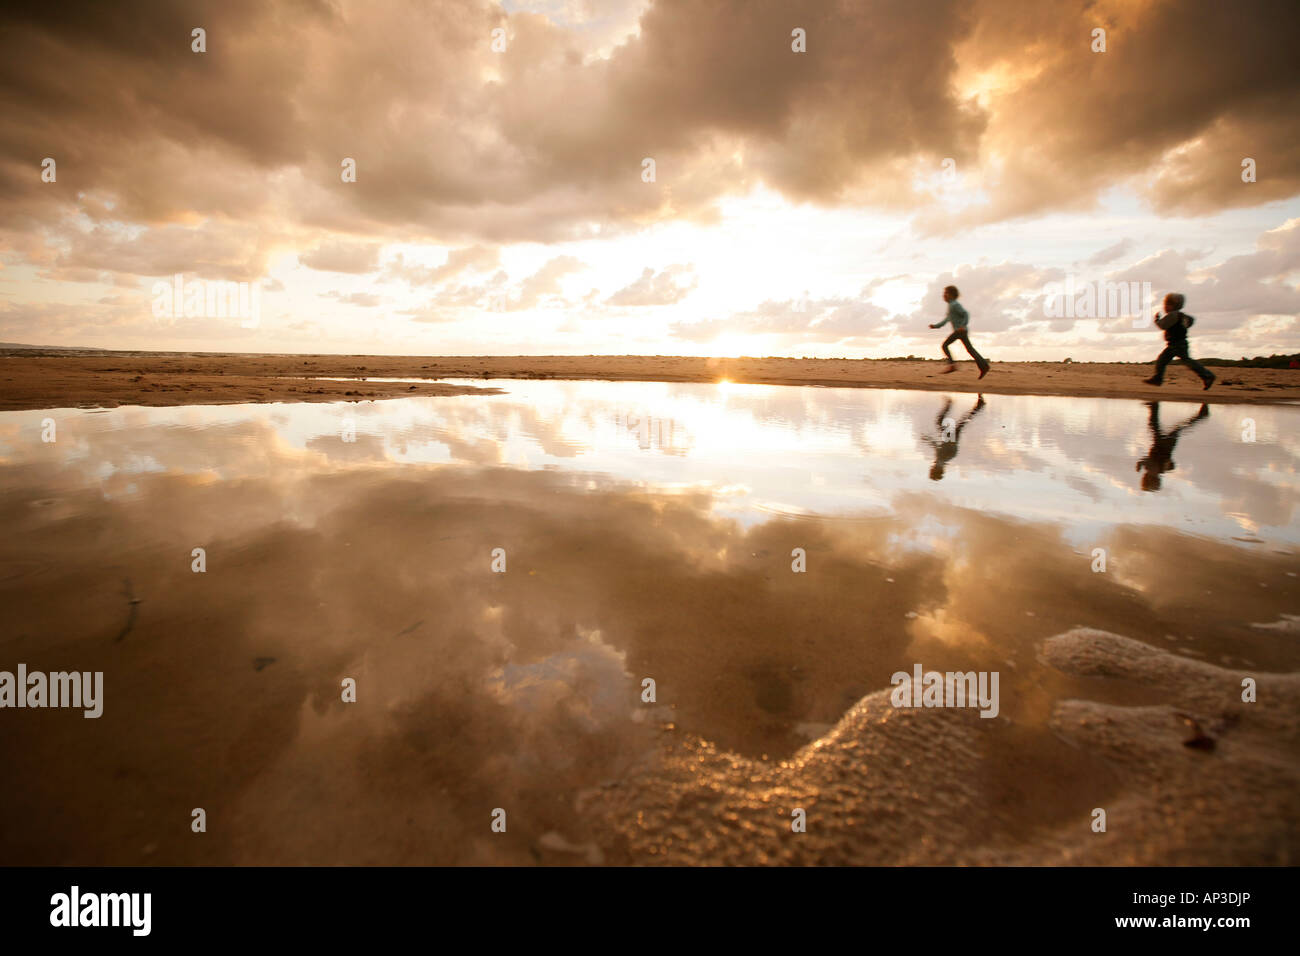 Two children running along the beach on a cloudy day, Reflection, Segeltorpstrandet, Halmstadt, Skane, Sweden Stock Photo